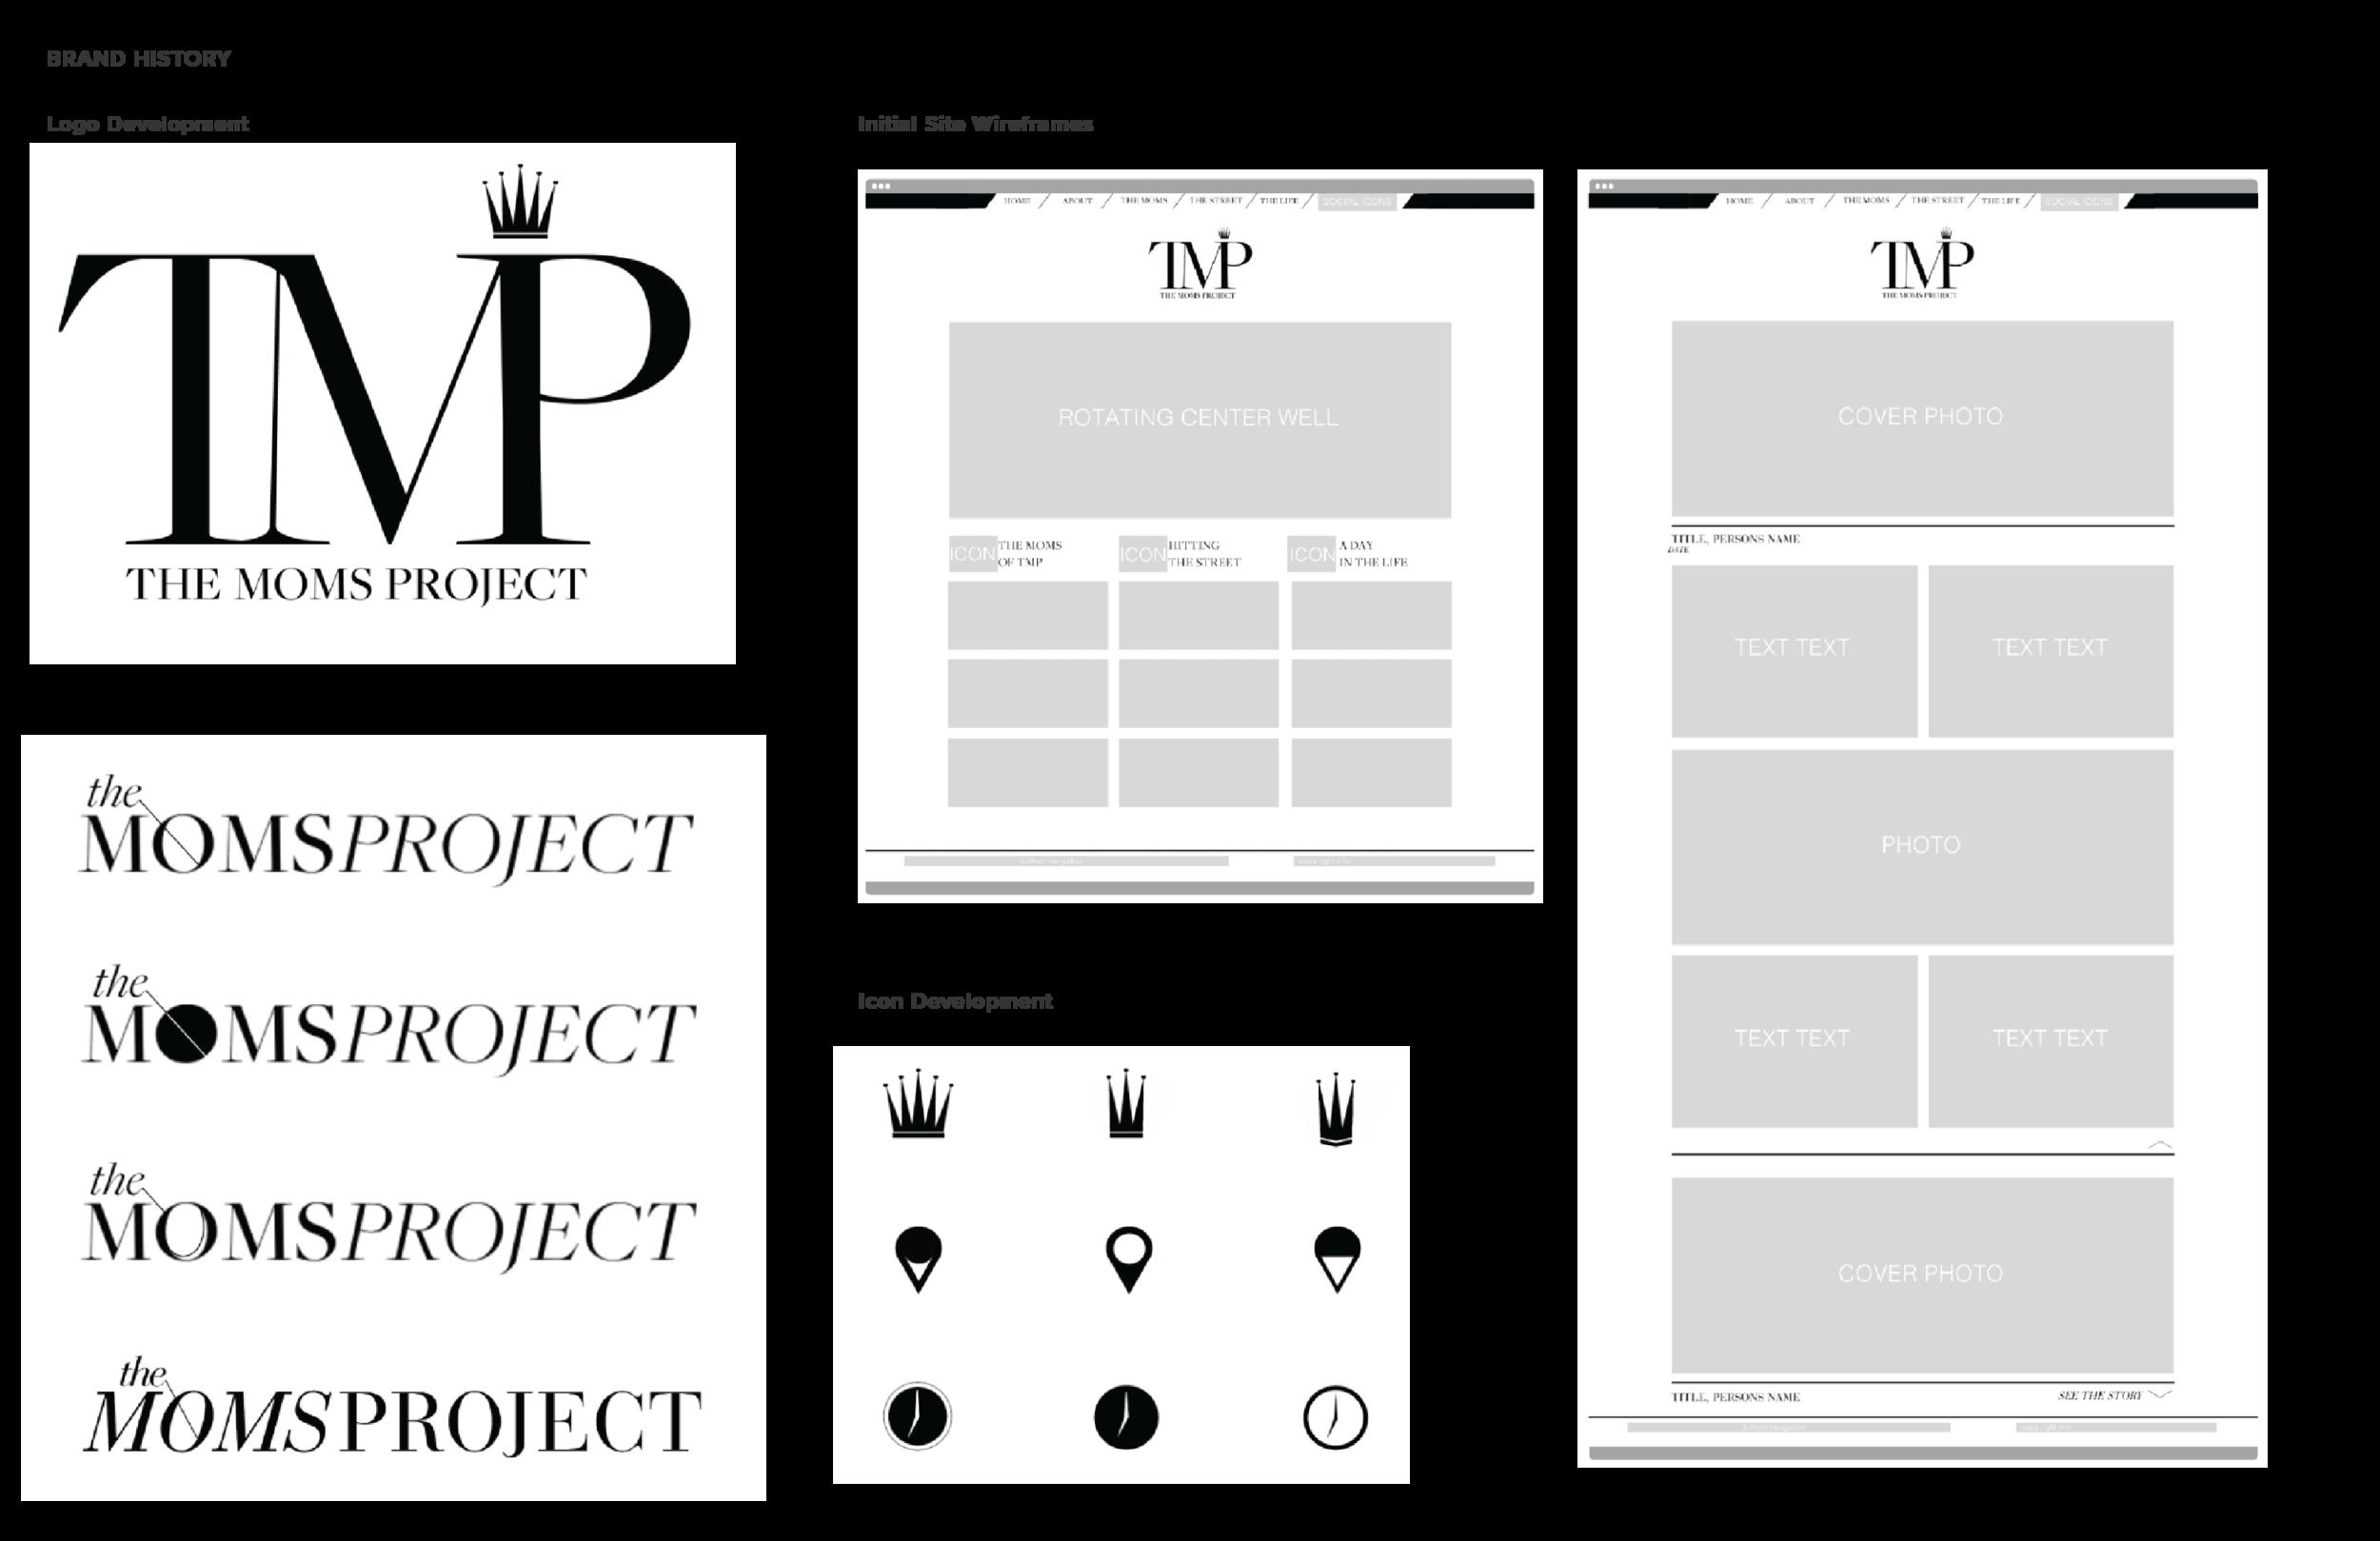 TPFW-Portfolio-mockups-06.png